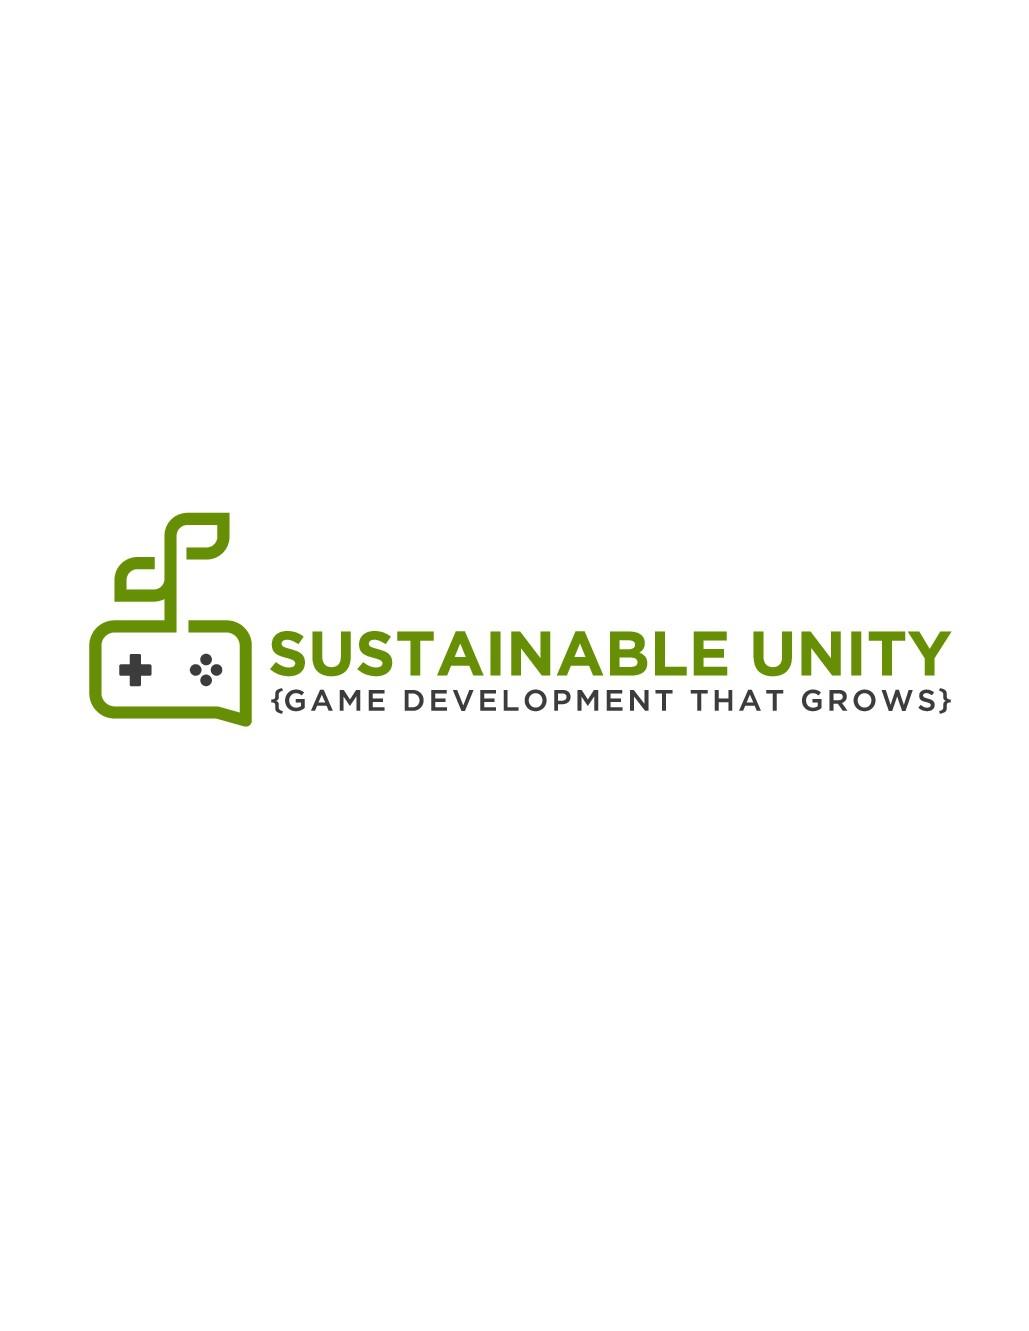 Game development training needs eco-friendly brand identity